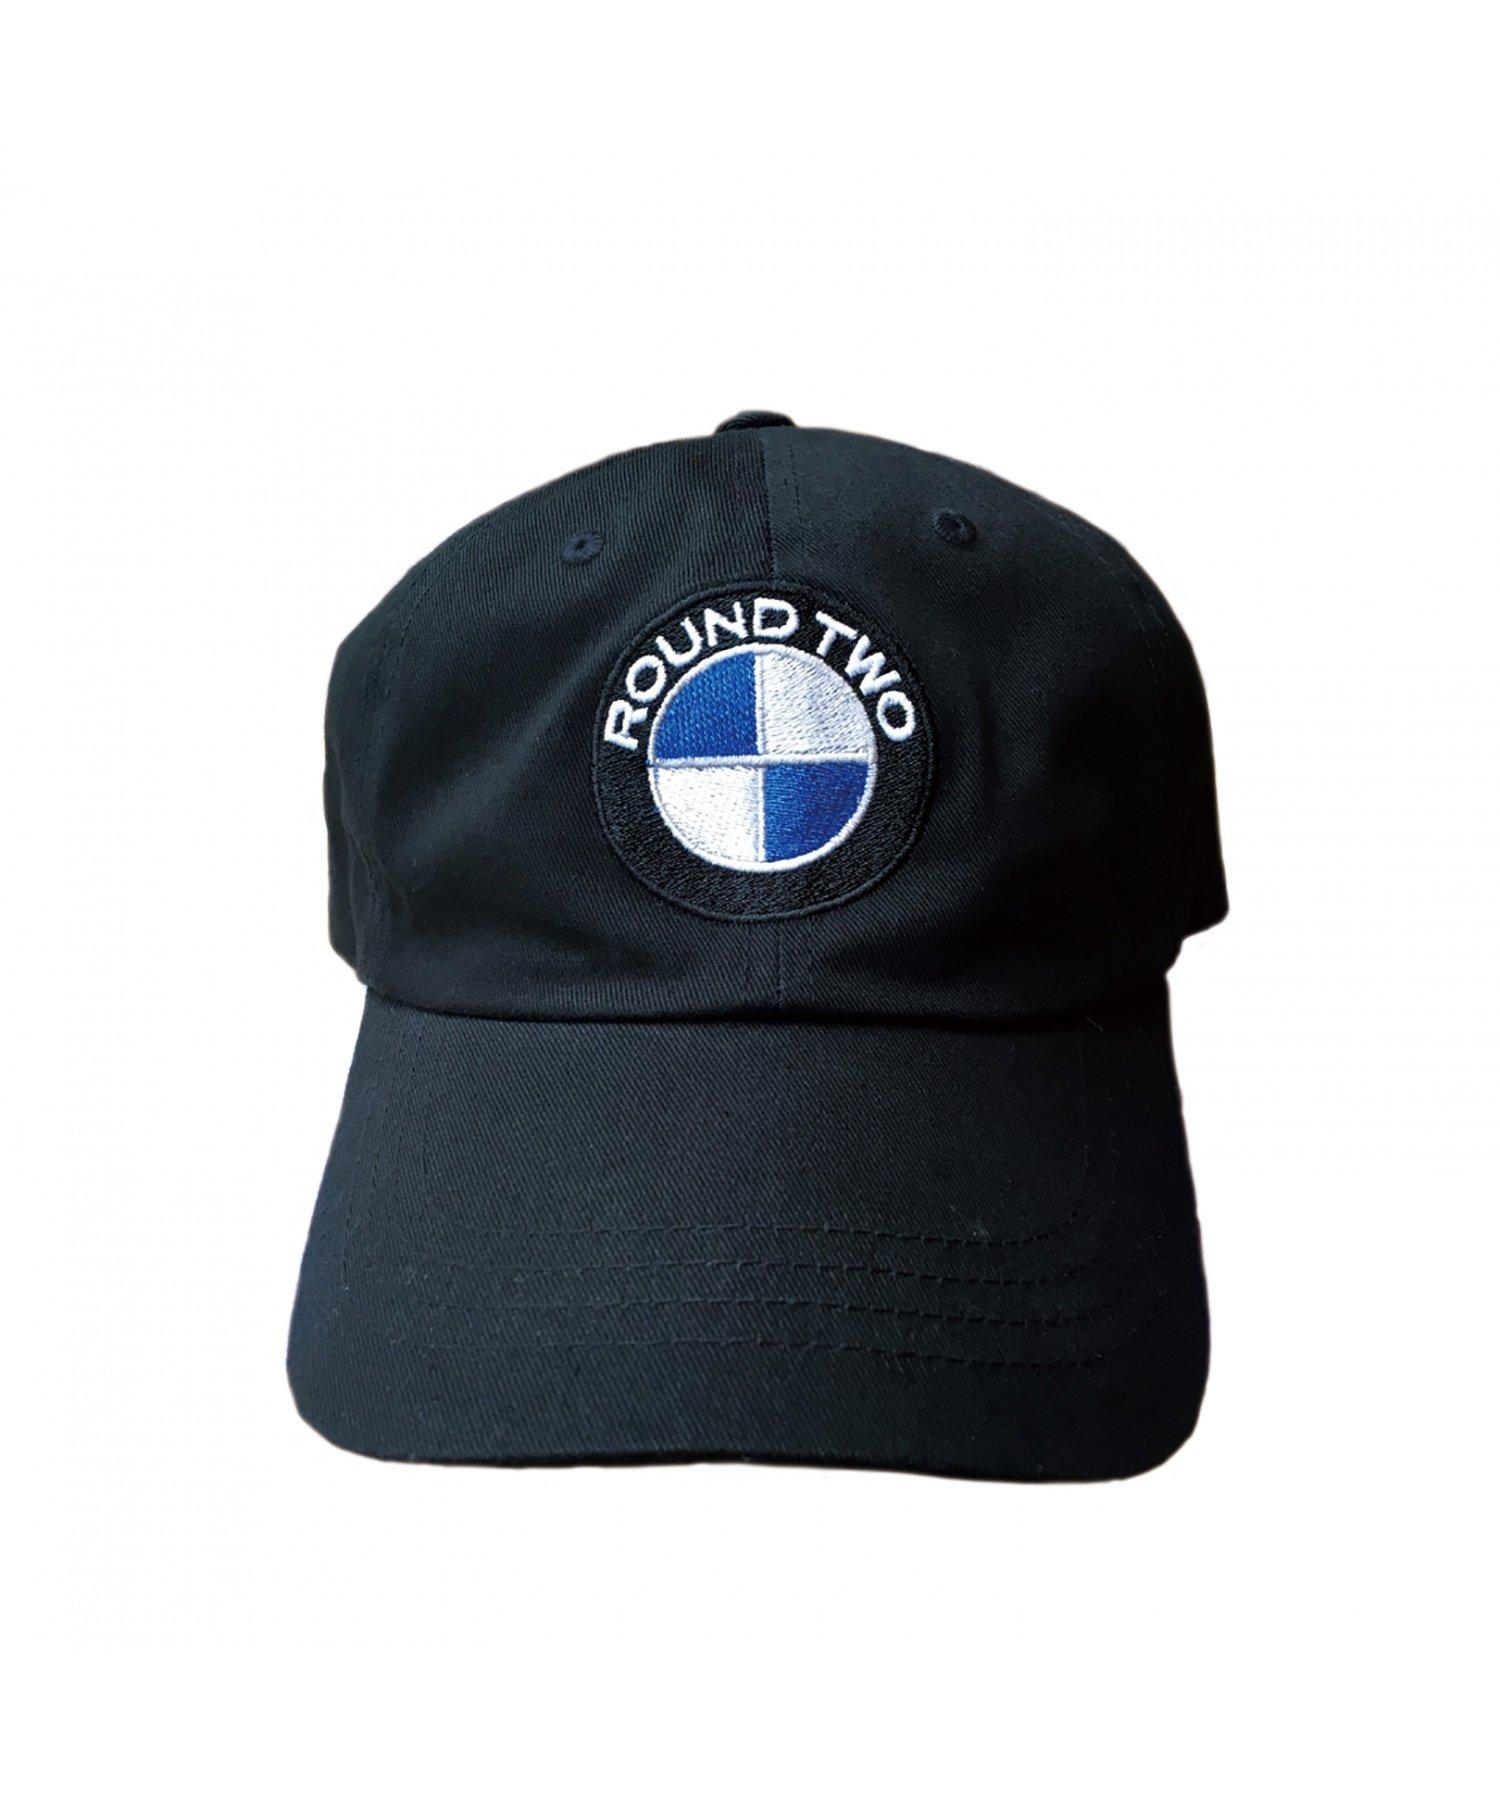 Round Two EMBLEM CAP